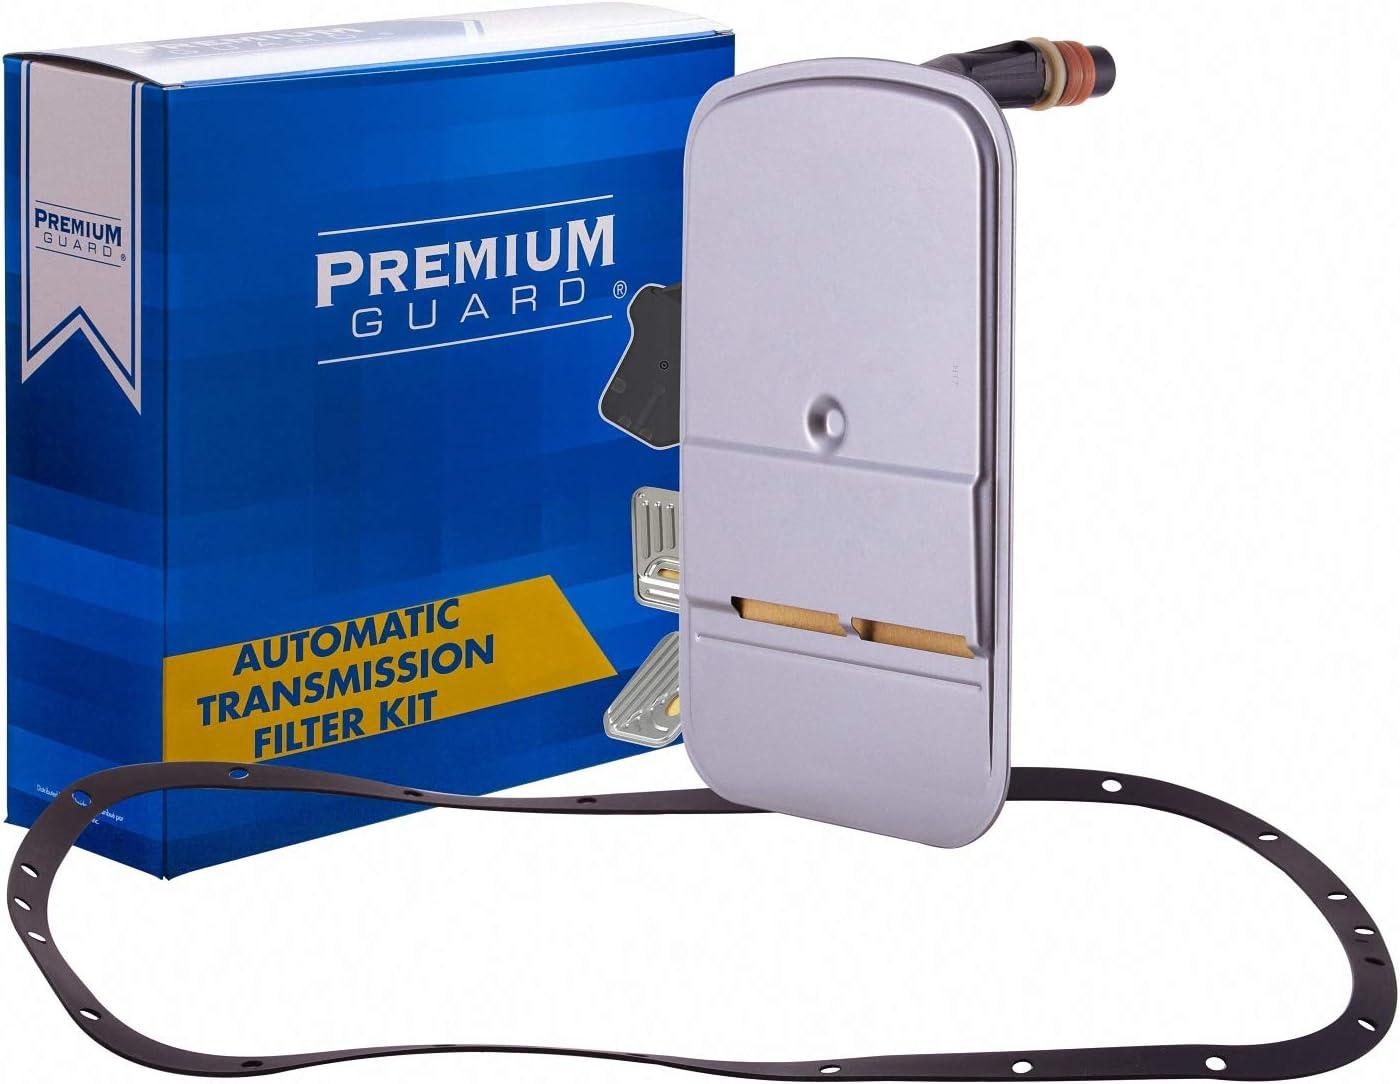 PG Automatic Transmission Filter PT1315 BMW 2000 2 323Ci Fits Direct sale of Rapid rise manufacturer